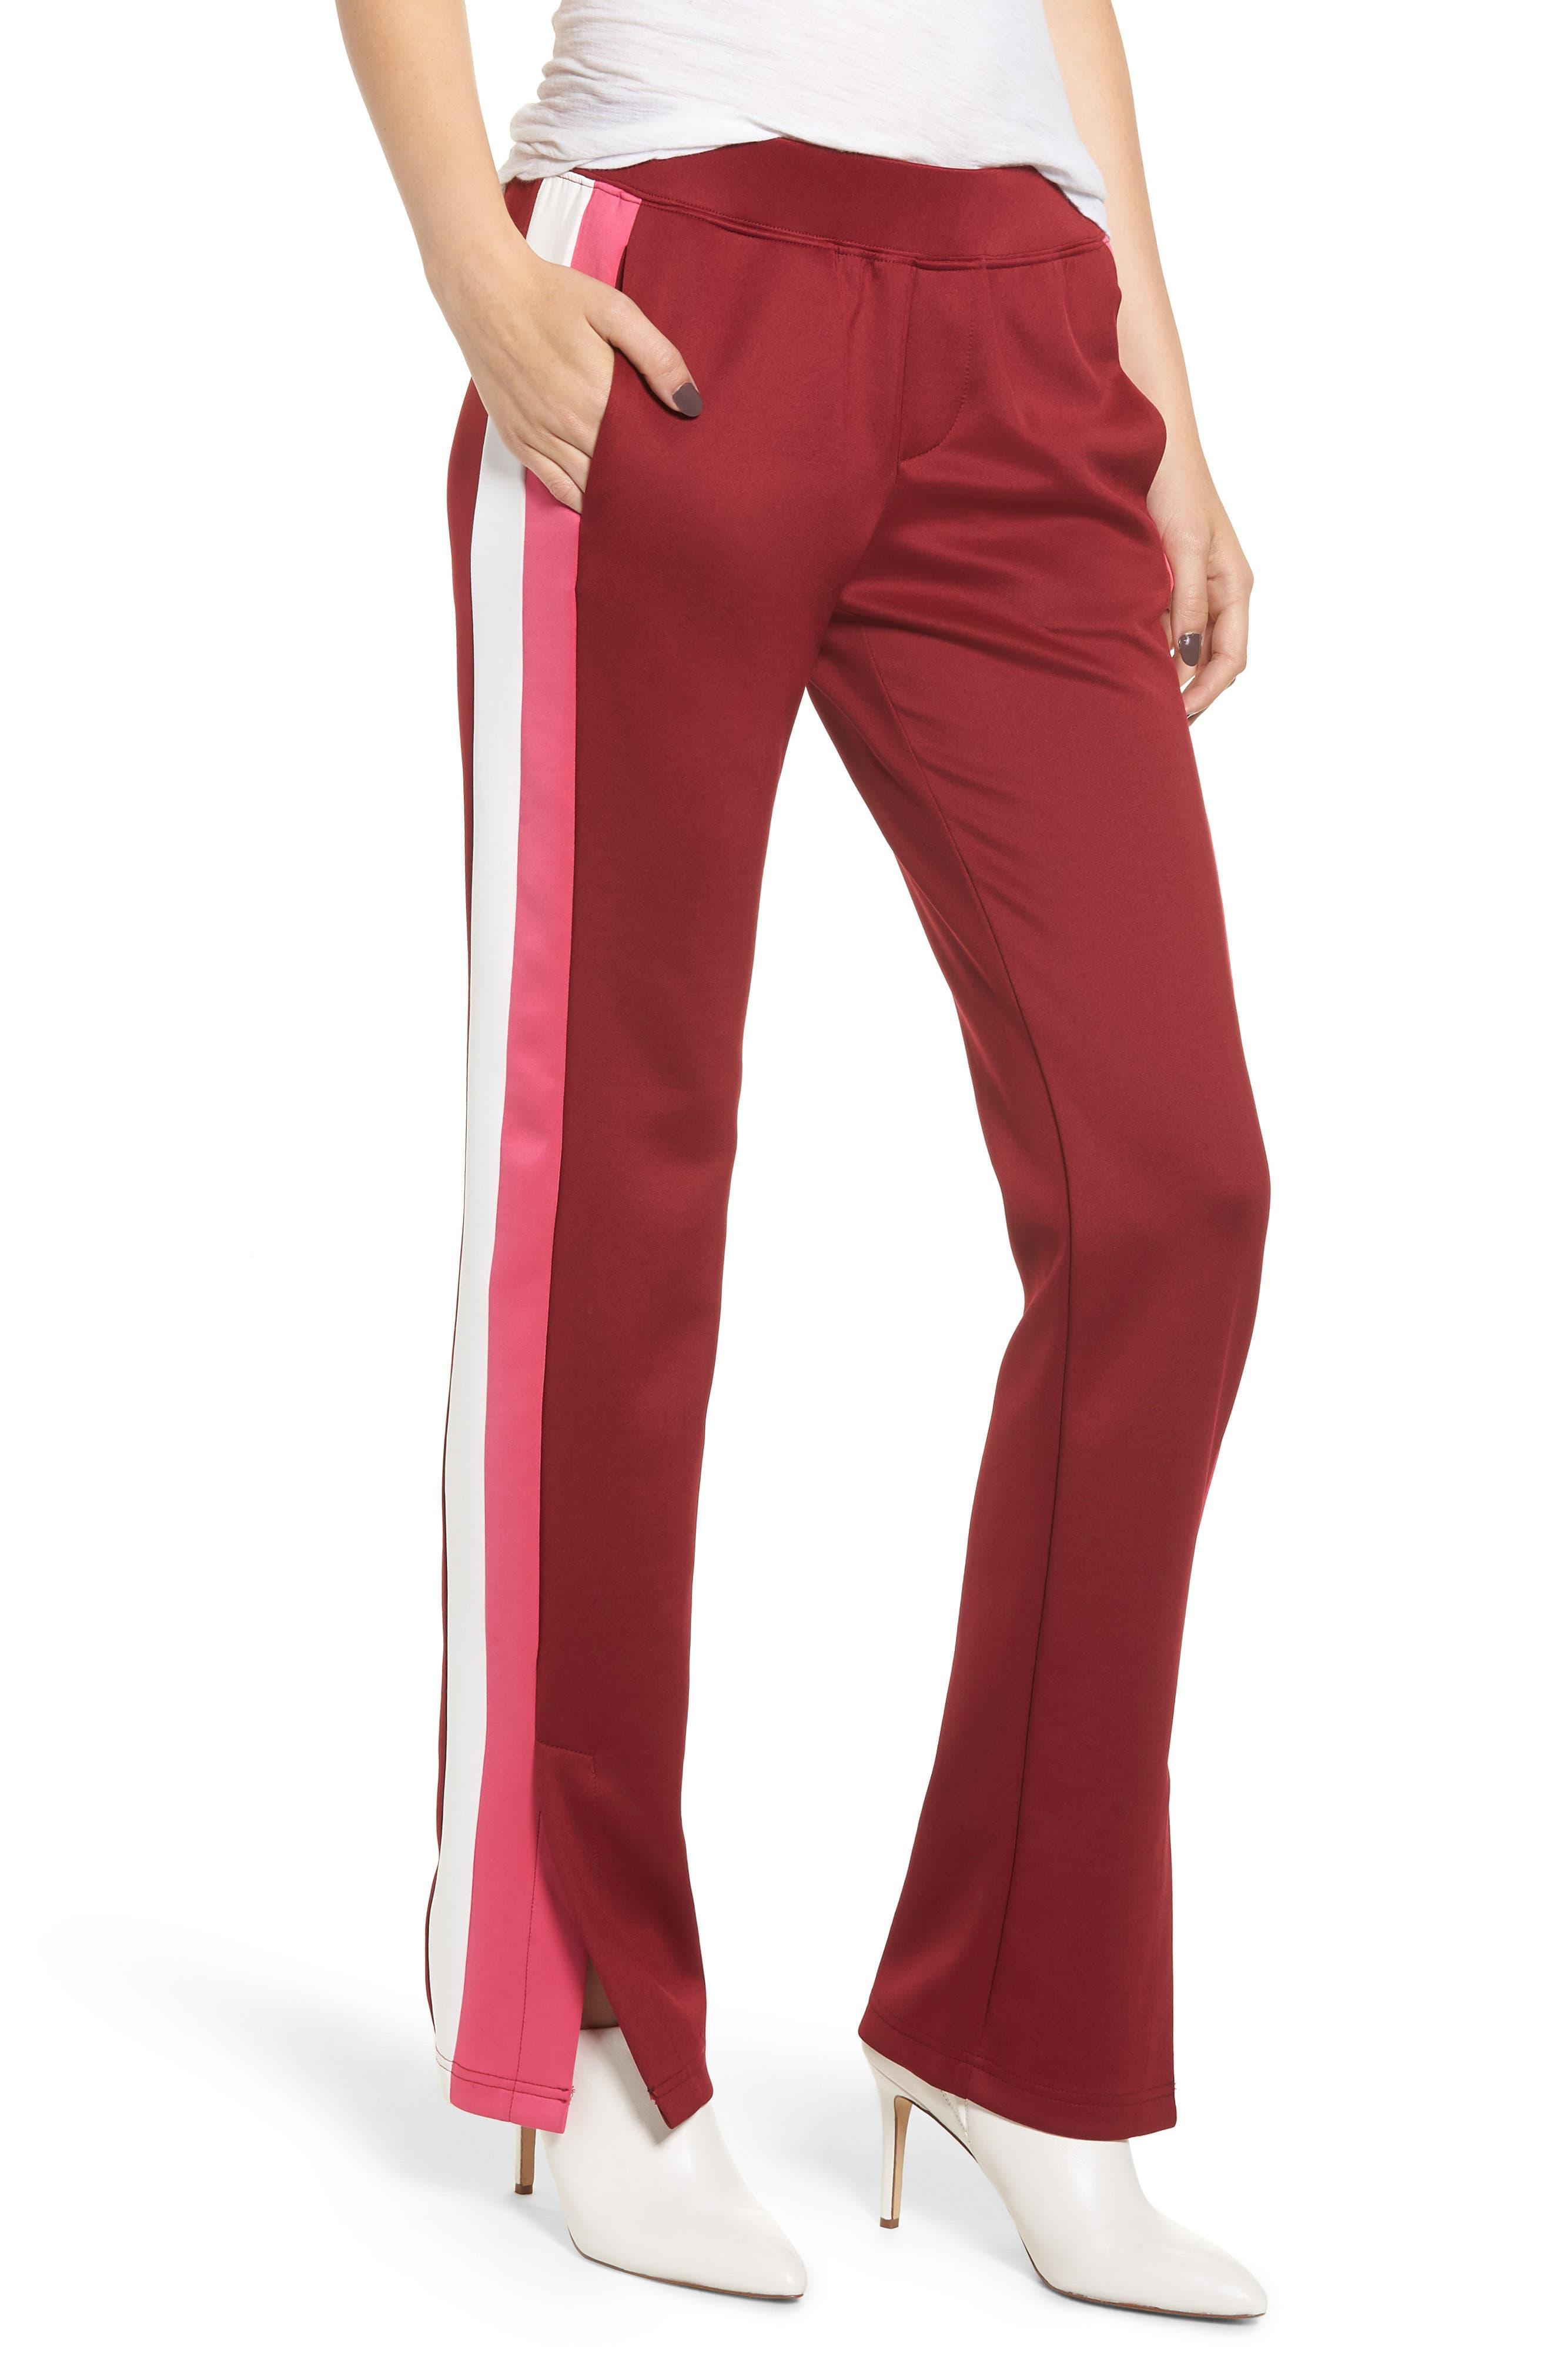 Microscuba Side Slit Track Pants,                         Main,                         color, BURGUNDY